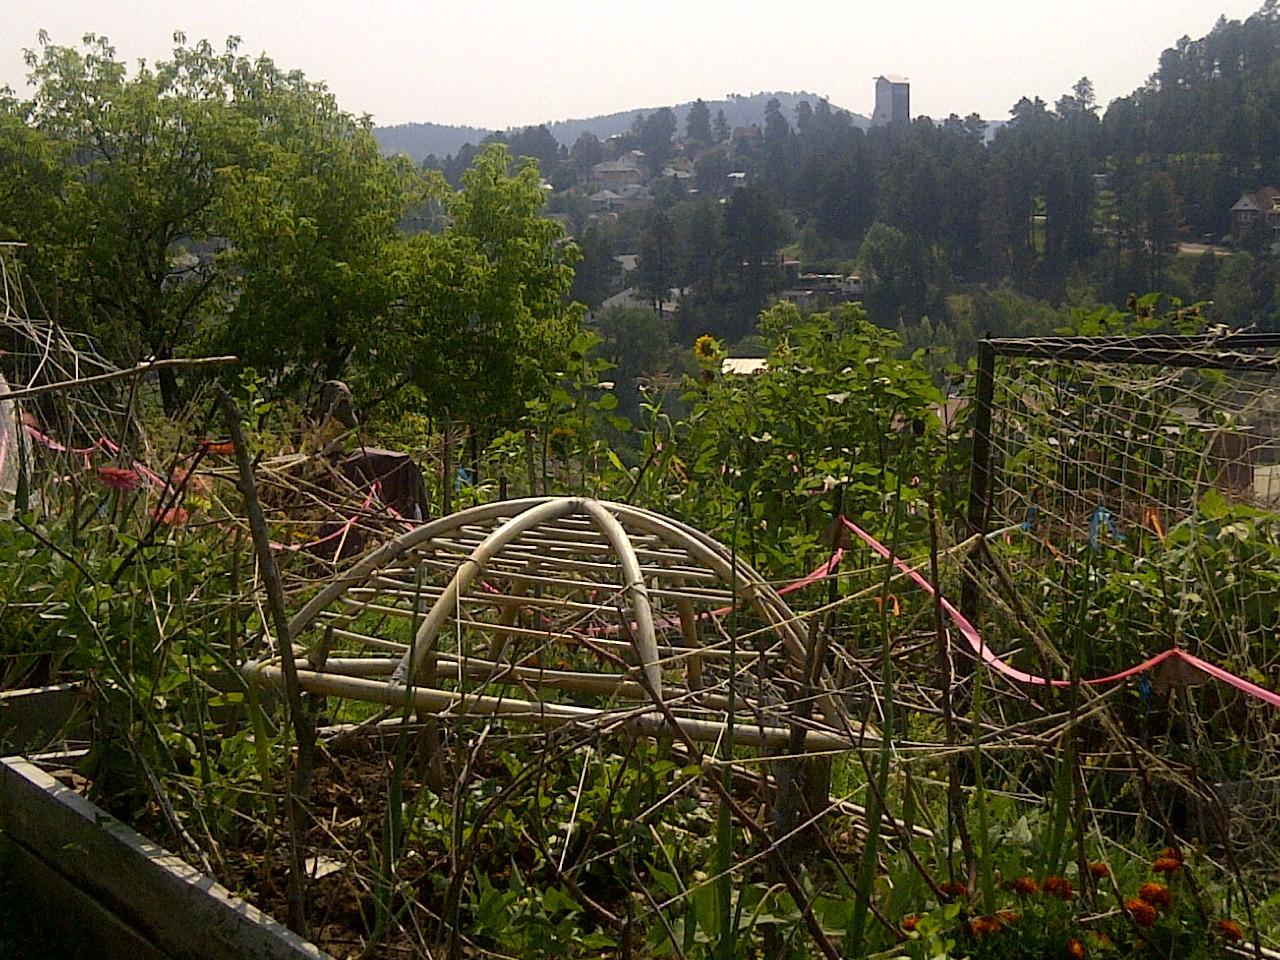 Lead Residents Turn Mining Buffer Zone Into Community Garden | SDPB ...